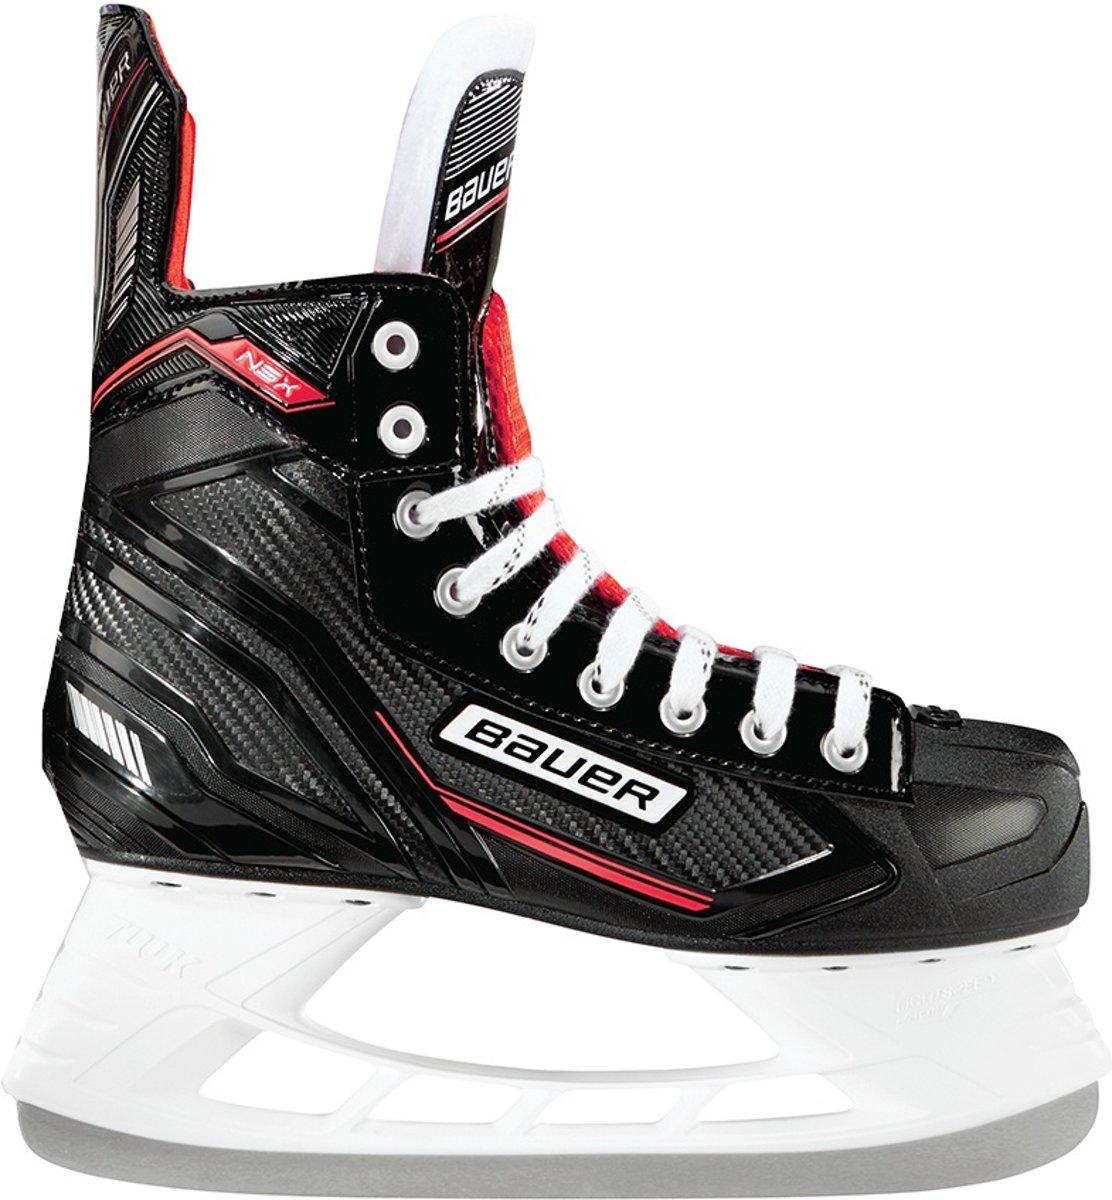 Bauer Ijshockeyschaatsen Nsx Skate Junior Zwart/rood Maat 33,5